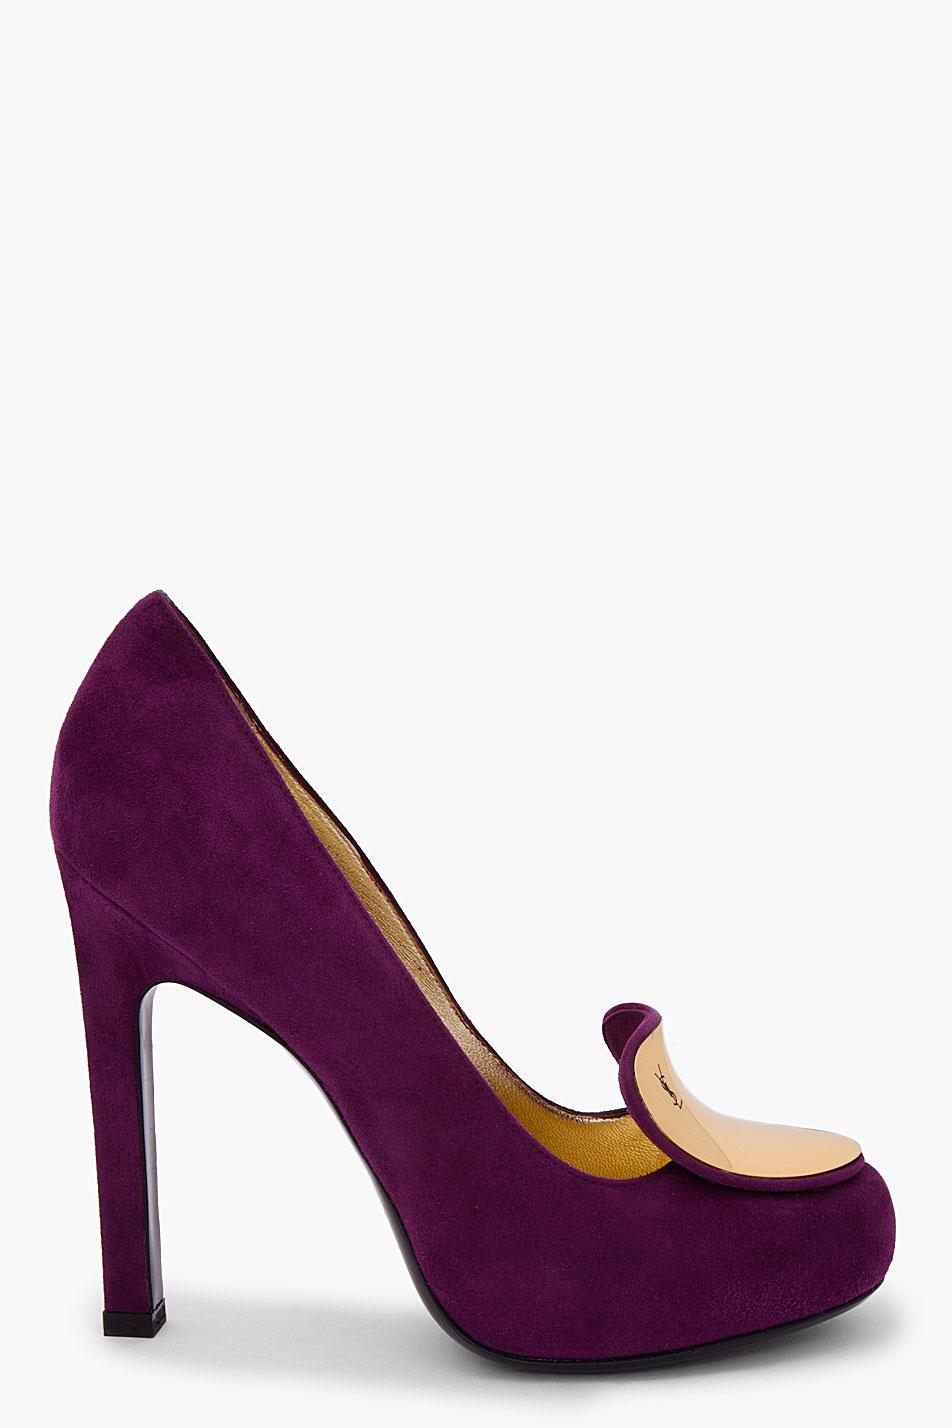 Lyst Saint Laurent Purple Suede Catherine Pumps In Purple